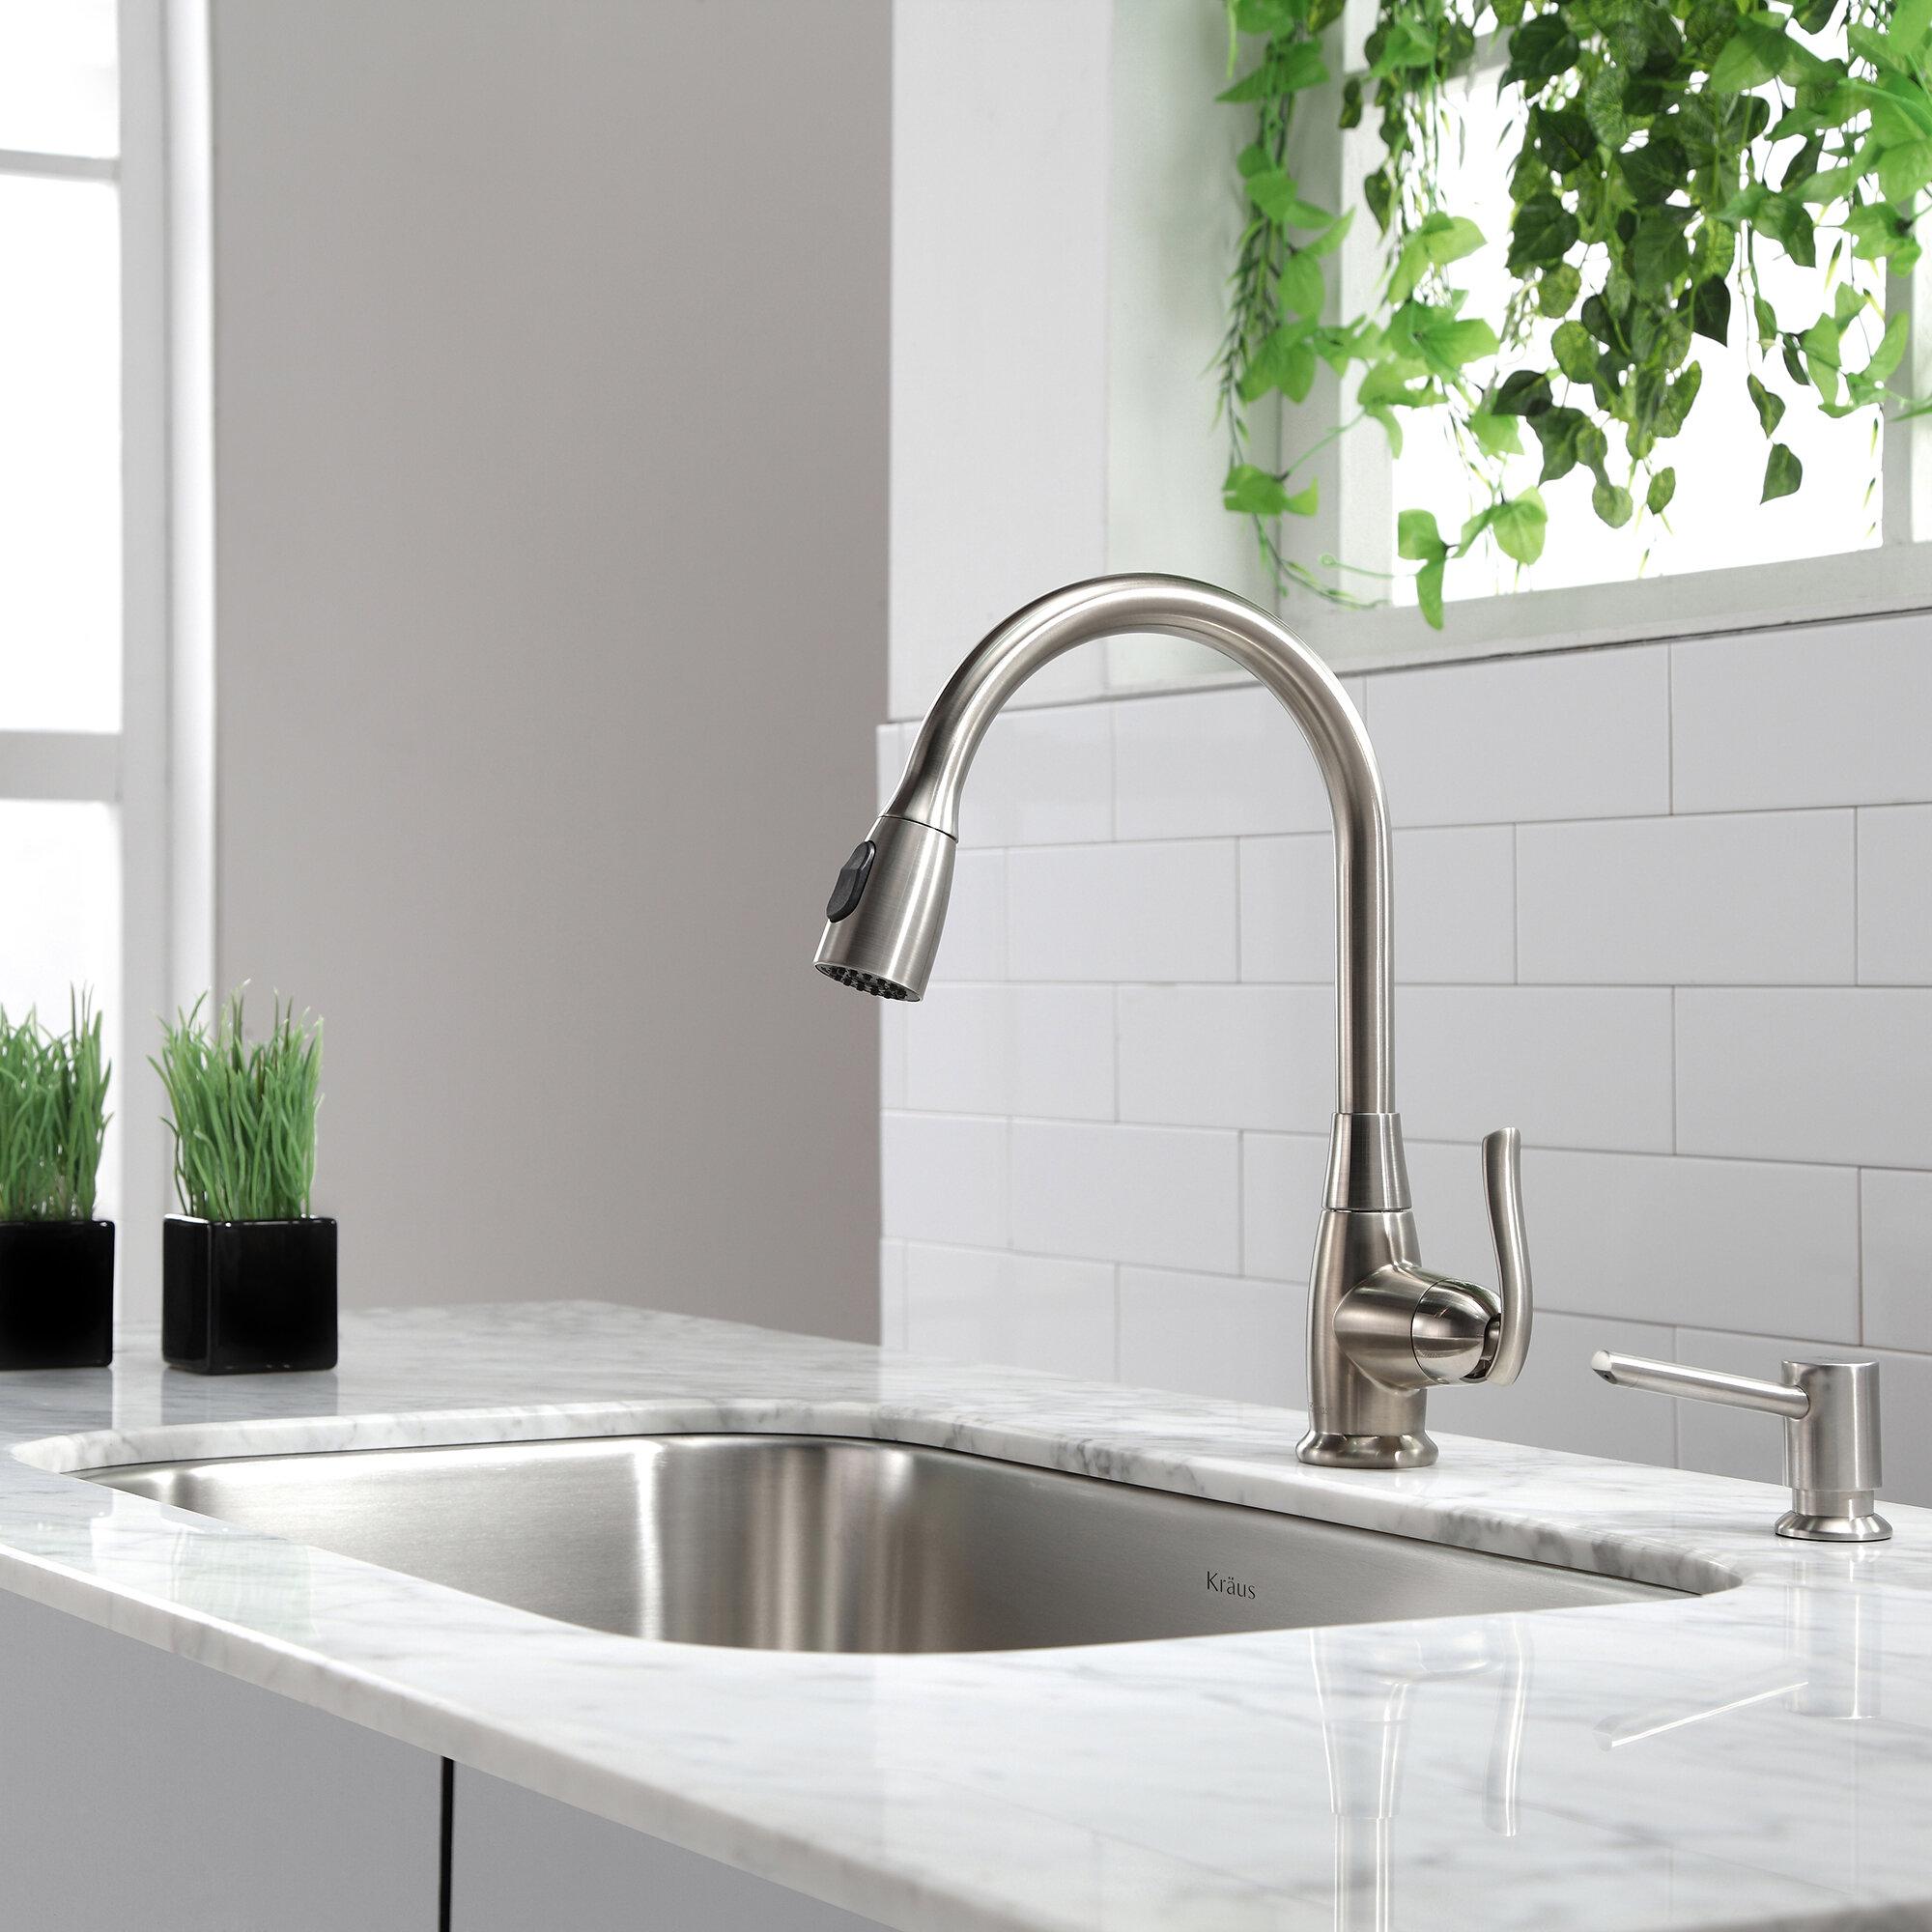 Kpf 2230ch Sn Orb Kraus Premium Faucets Pull Down Single Handle